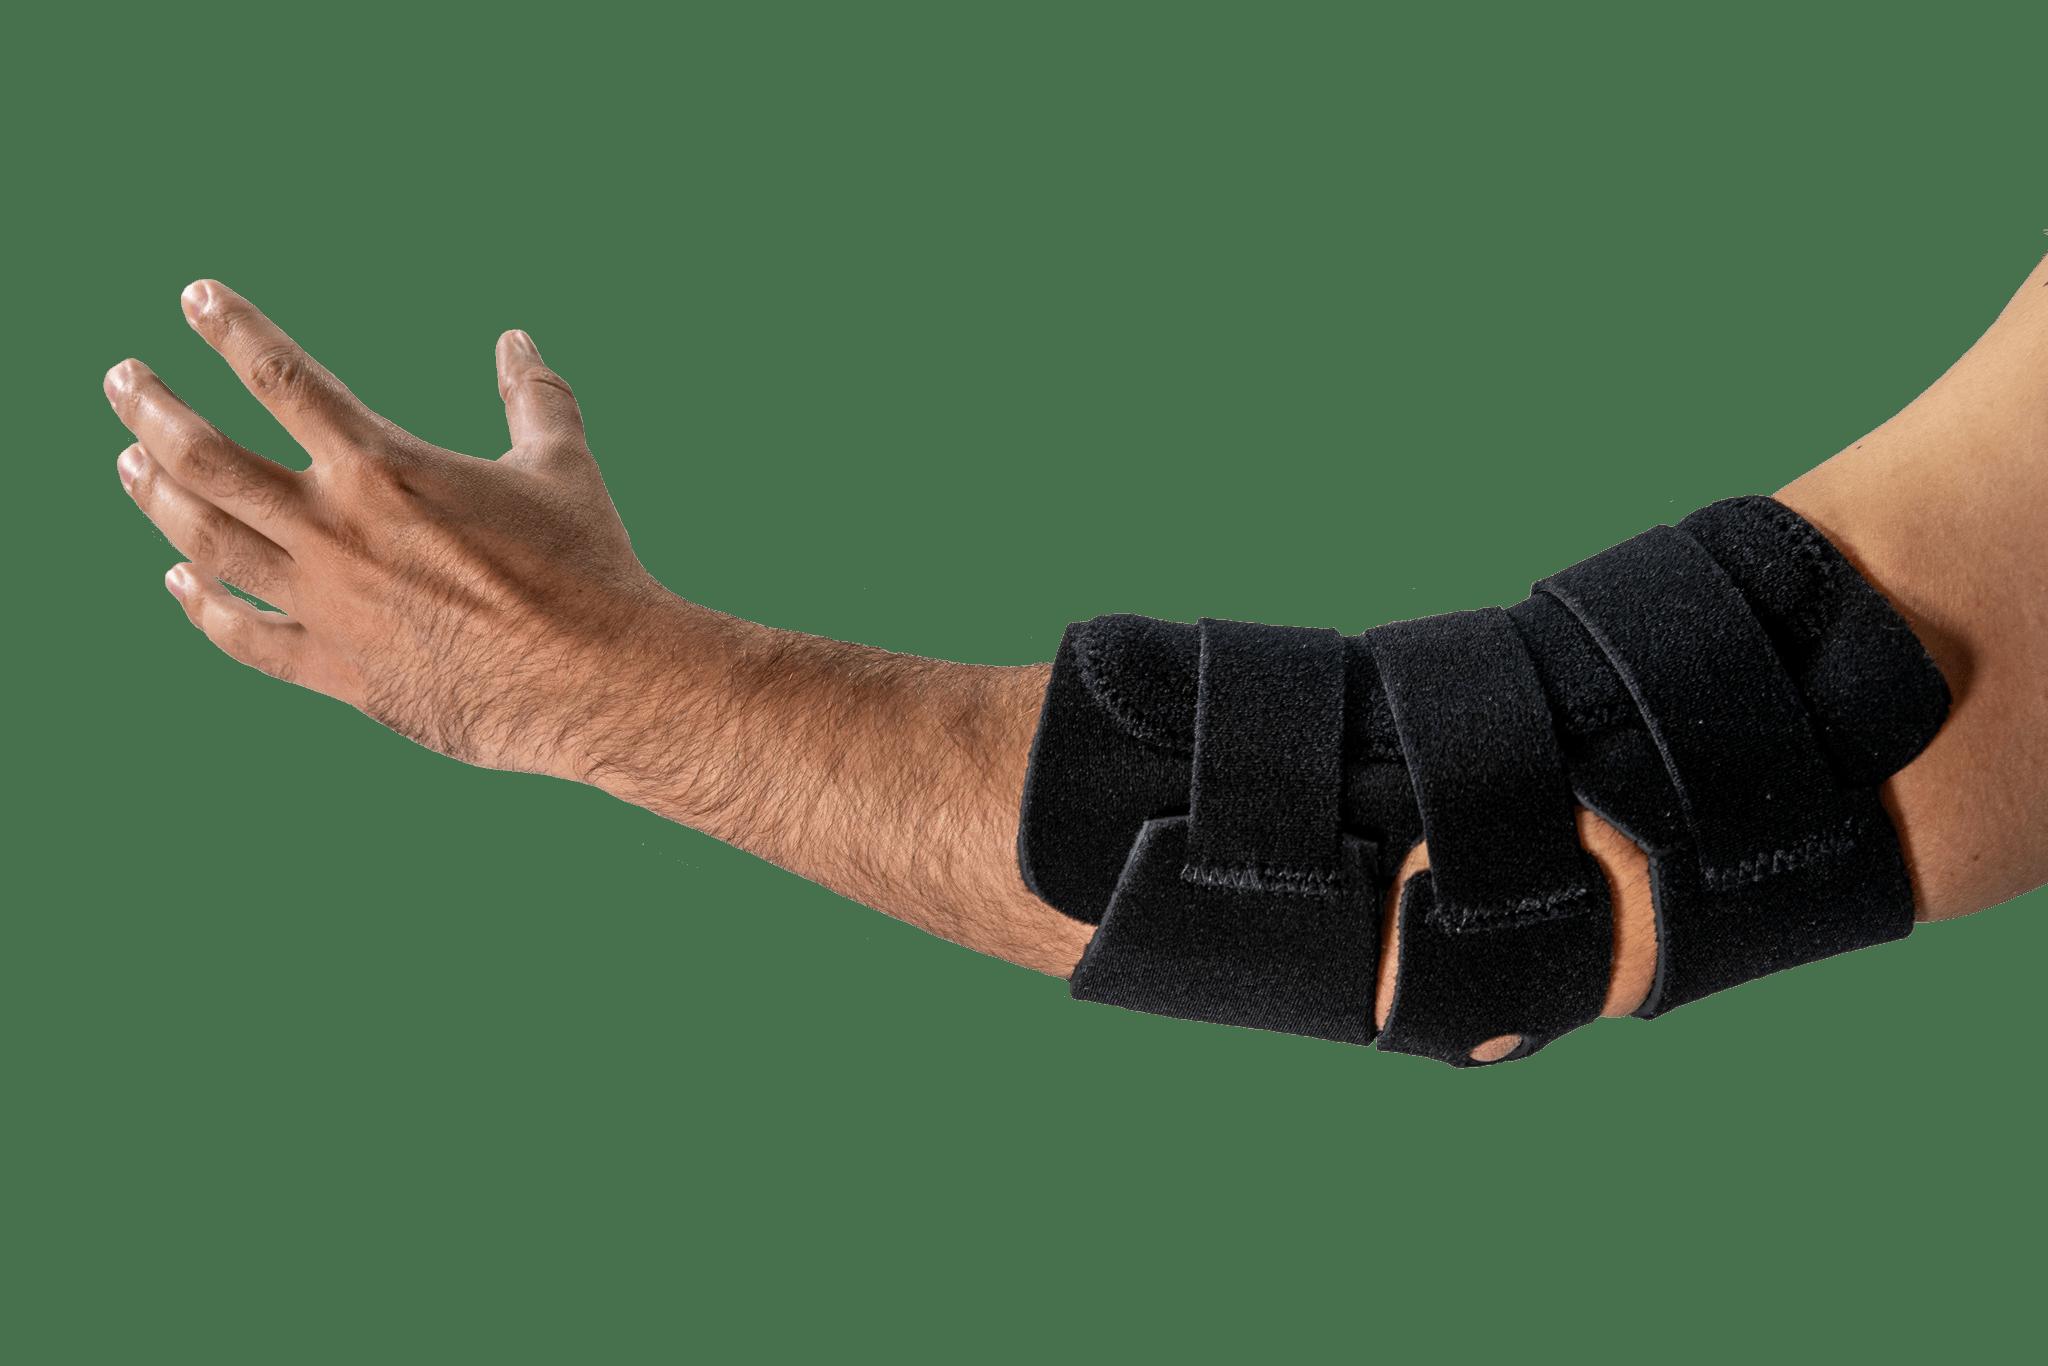 An elbow orthotic on an arm.